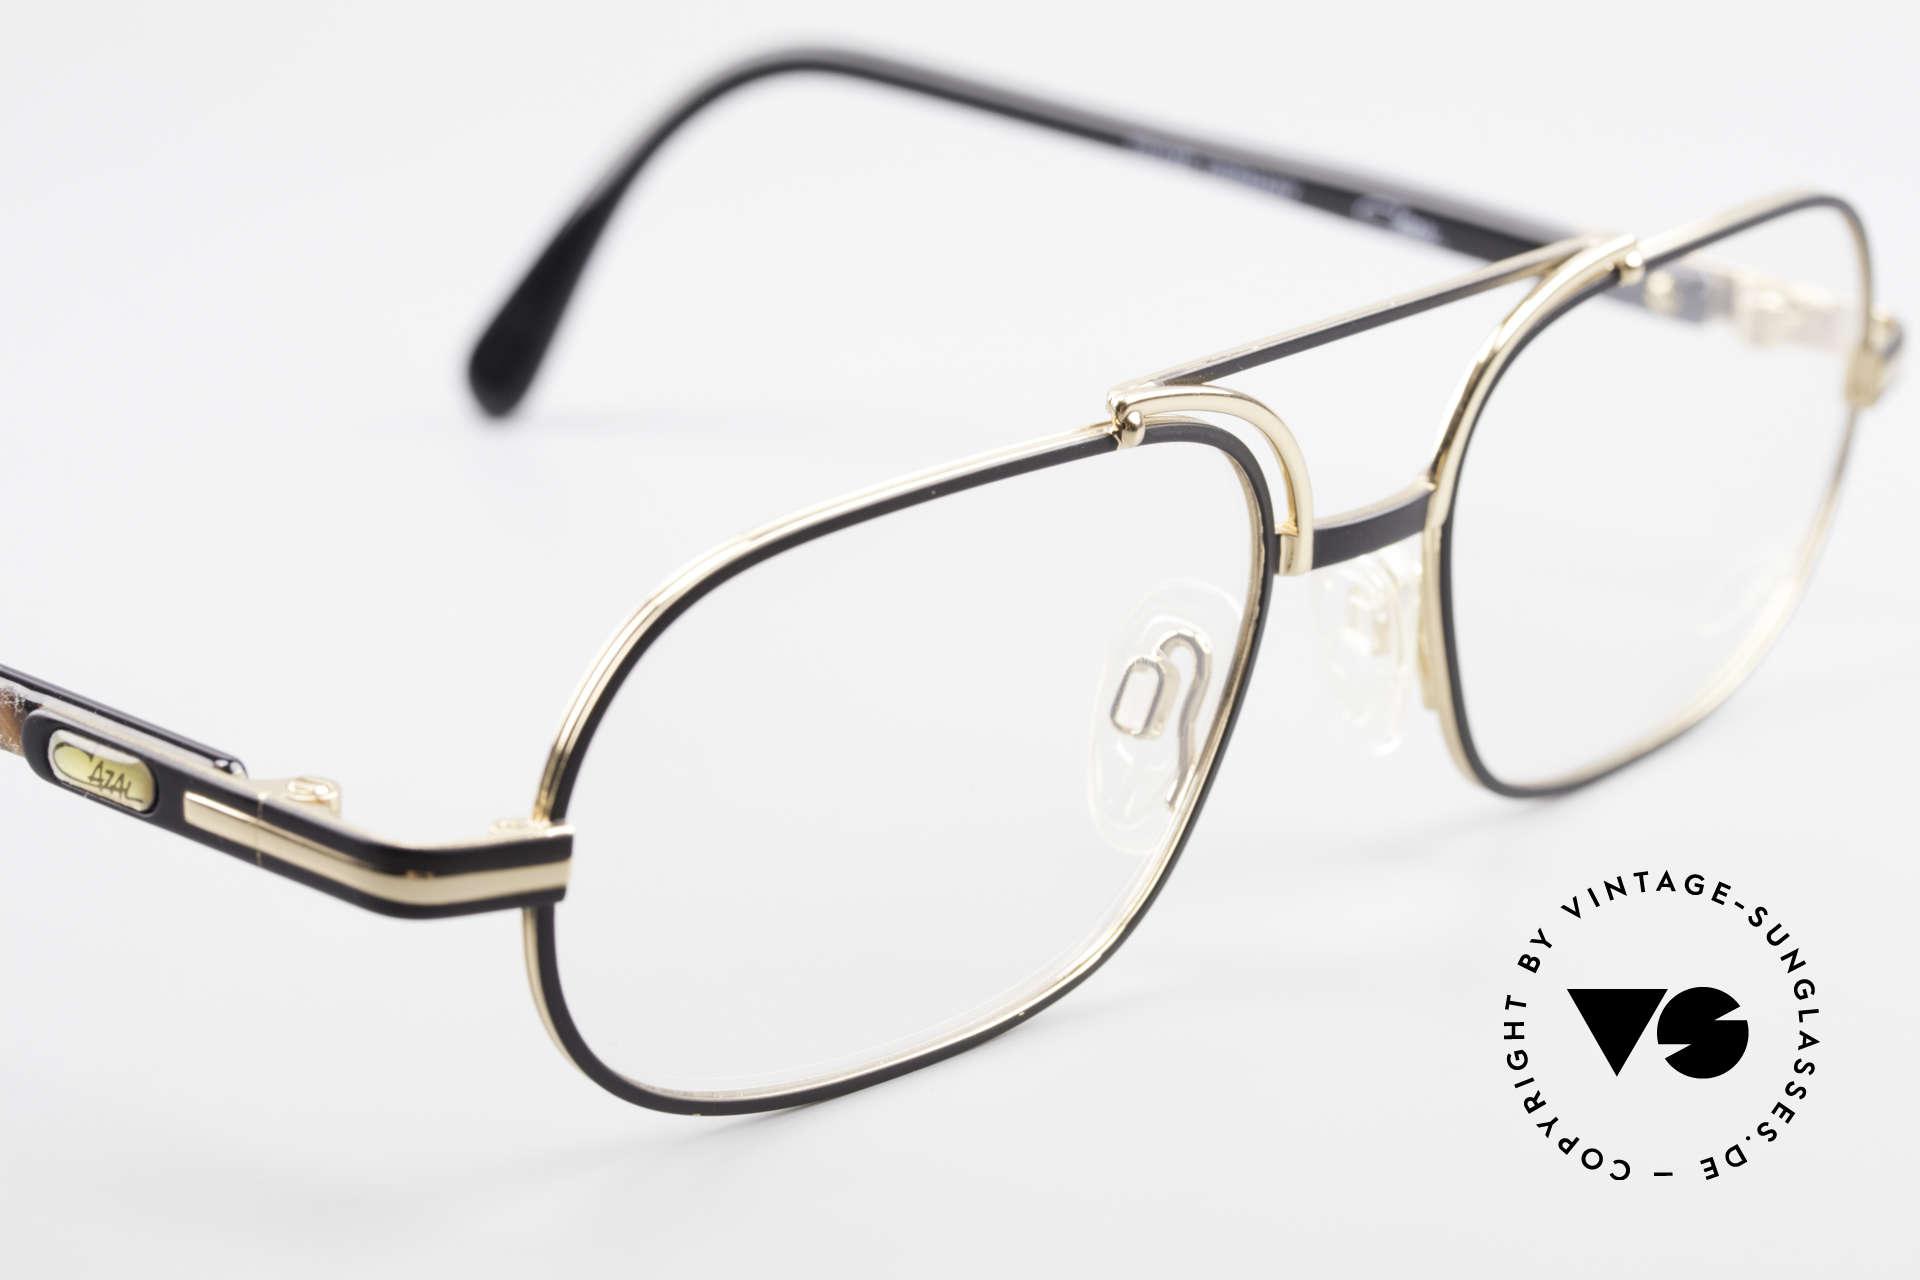 Cazal 747 Vintage 90's Designer Frame, new old stock: like all our rare vintage Cazal eyewear, Made for Men